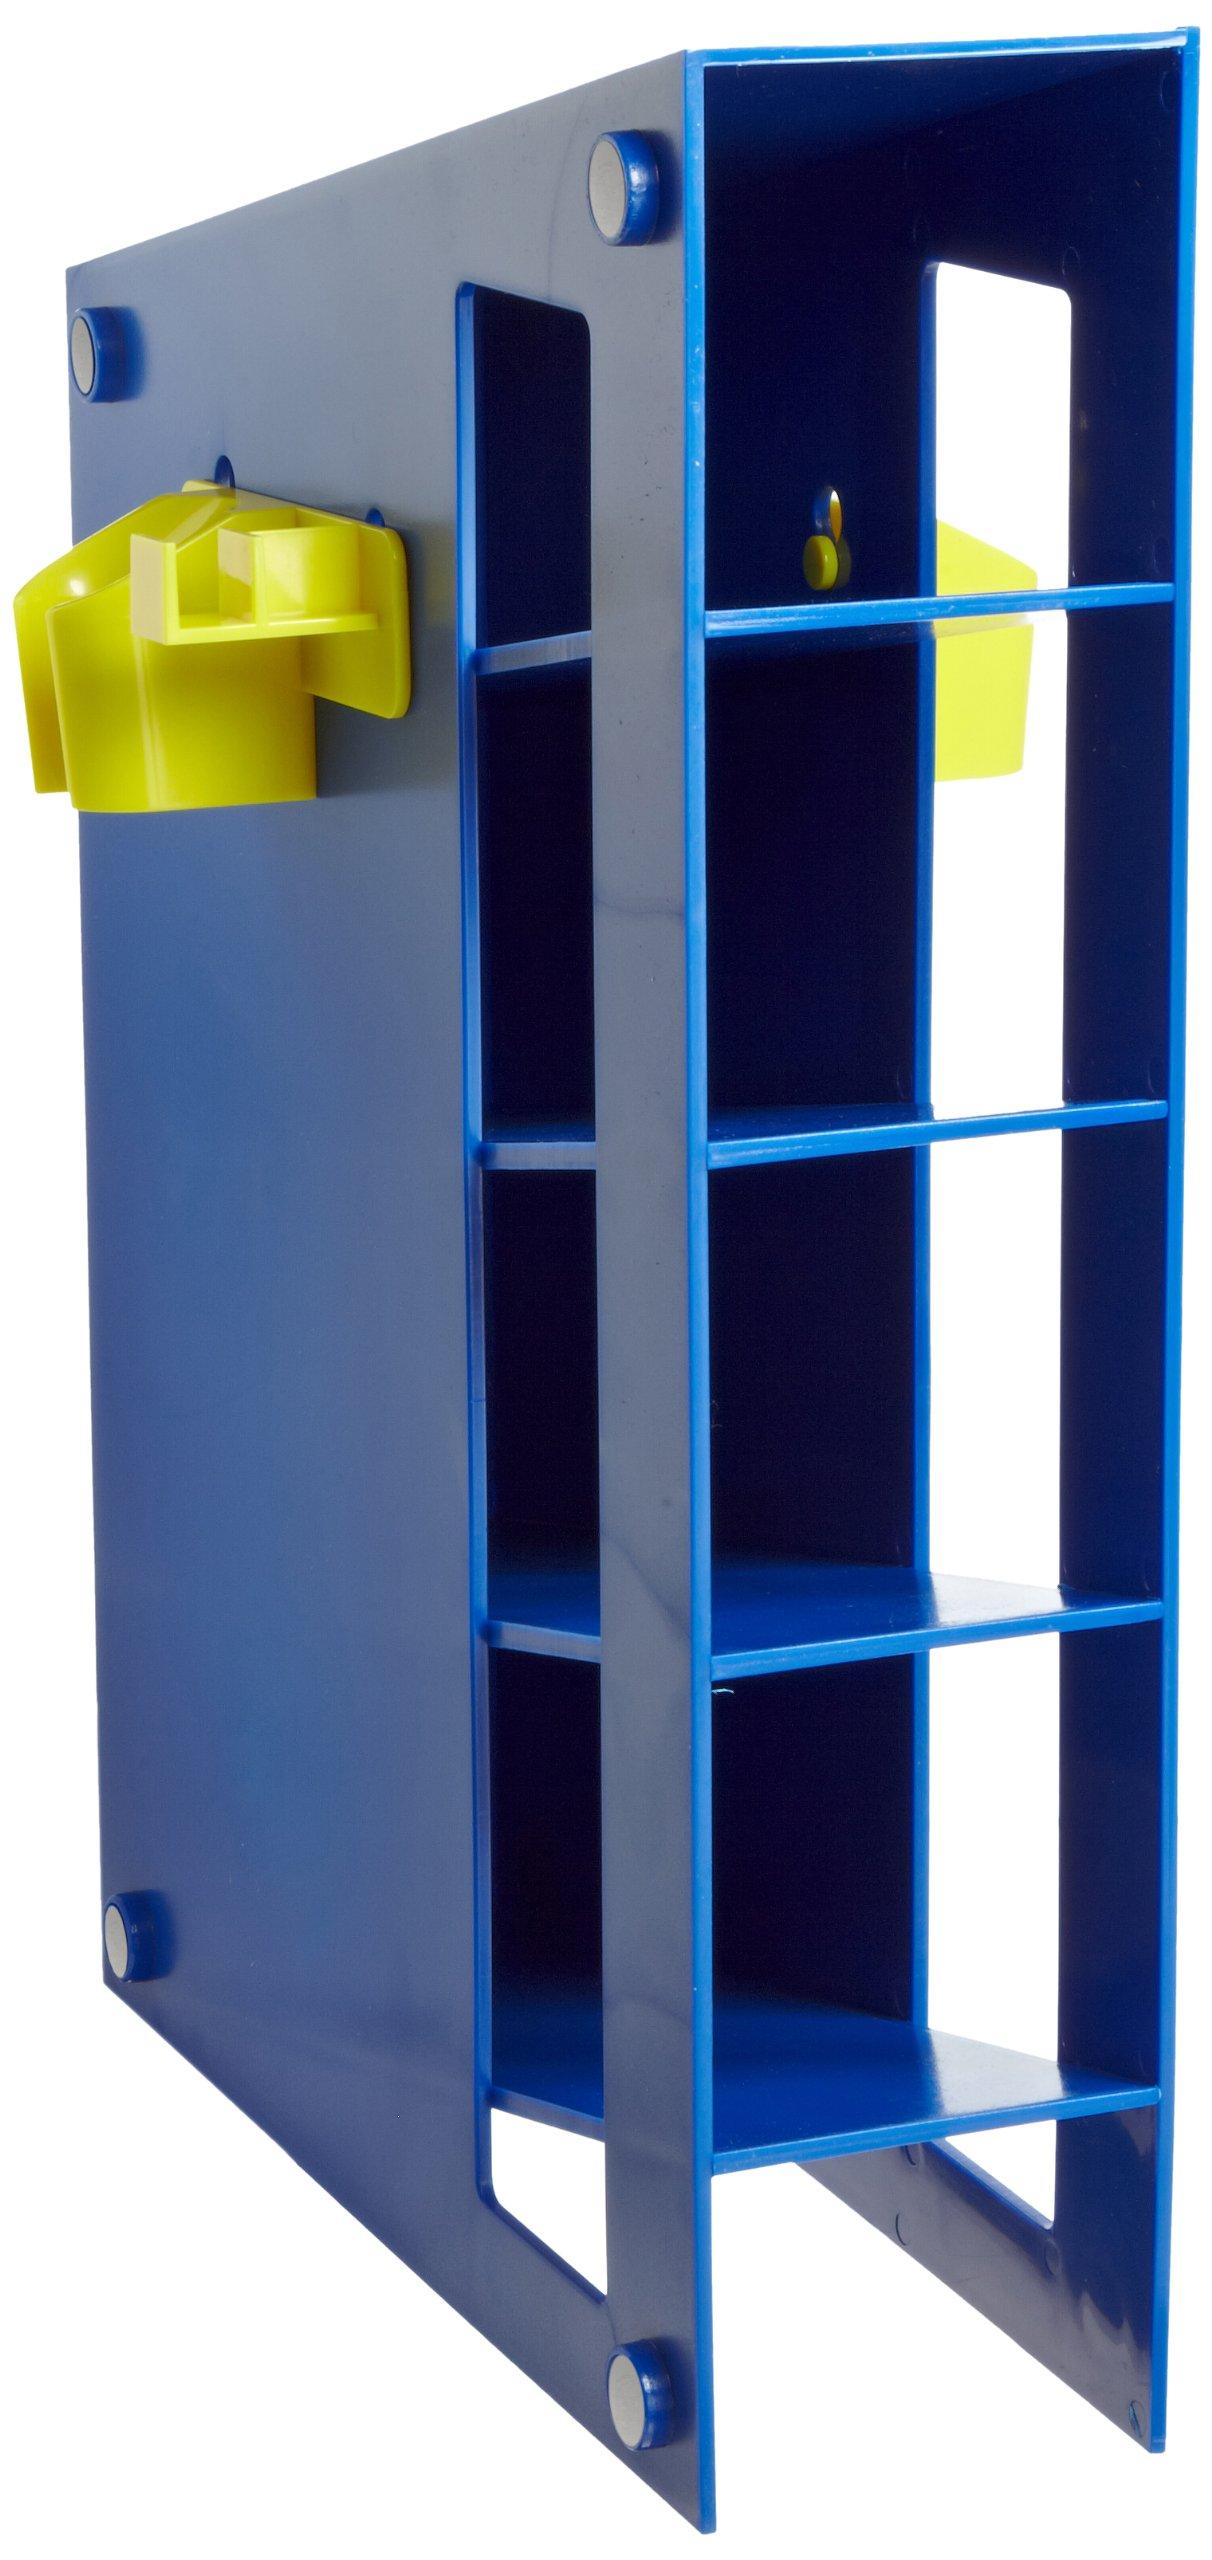 Heathrow Scientific HD20612M Blue ABS Plastic Magnetized Manual Pipette Rack, 291mm Length x 88mm Width x 401mm Height by Heathrow Scientific